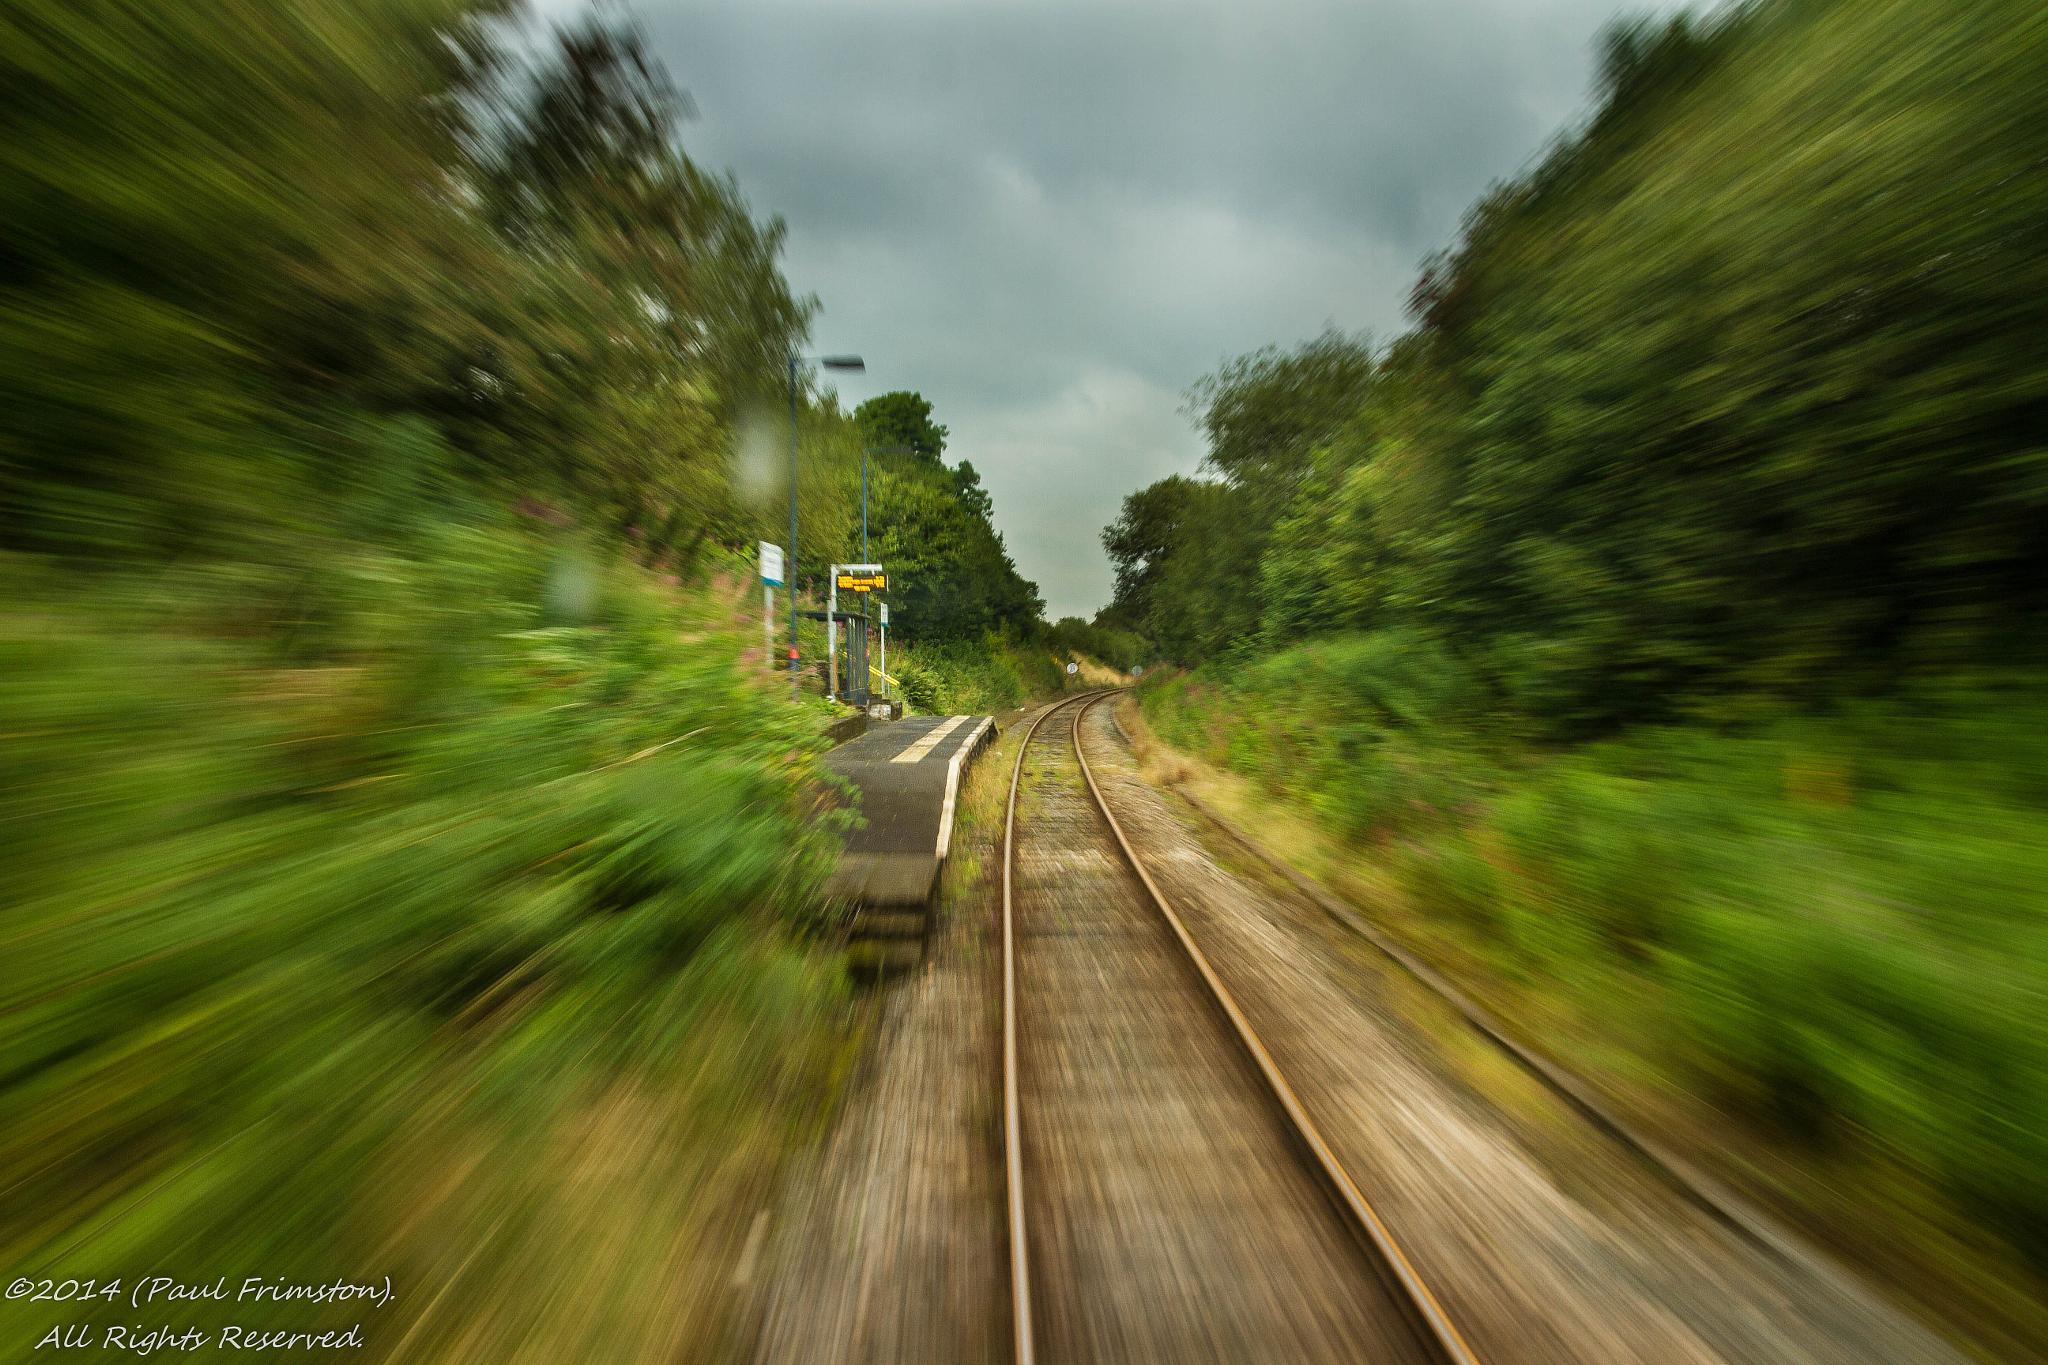 Short Platform by Paul Frimston